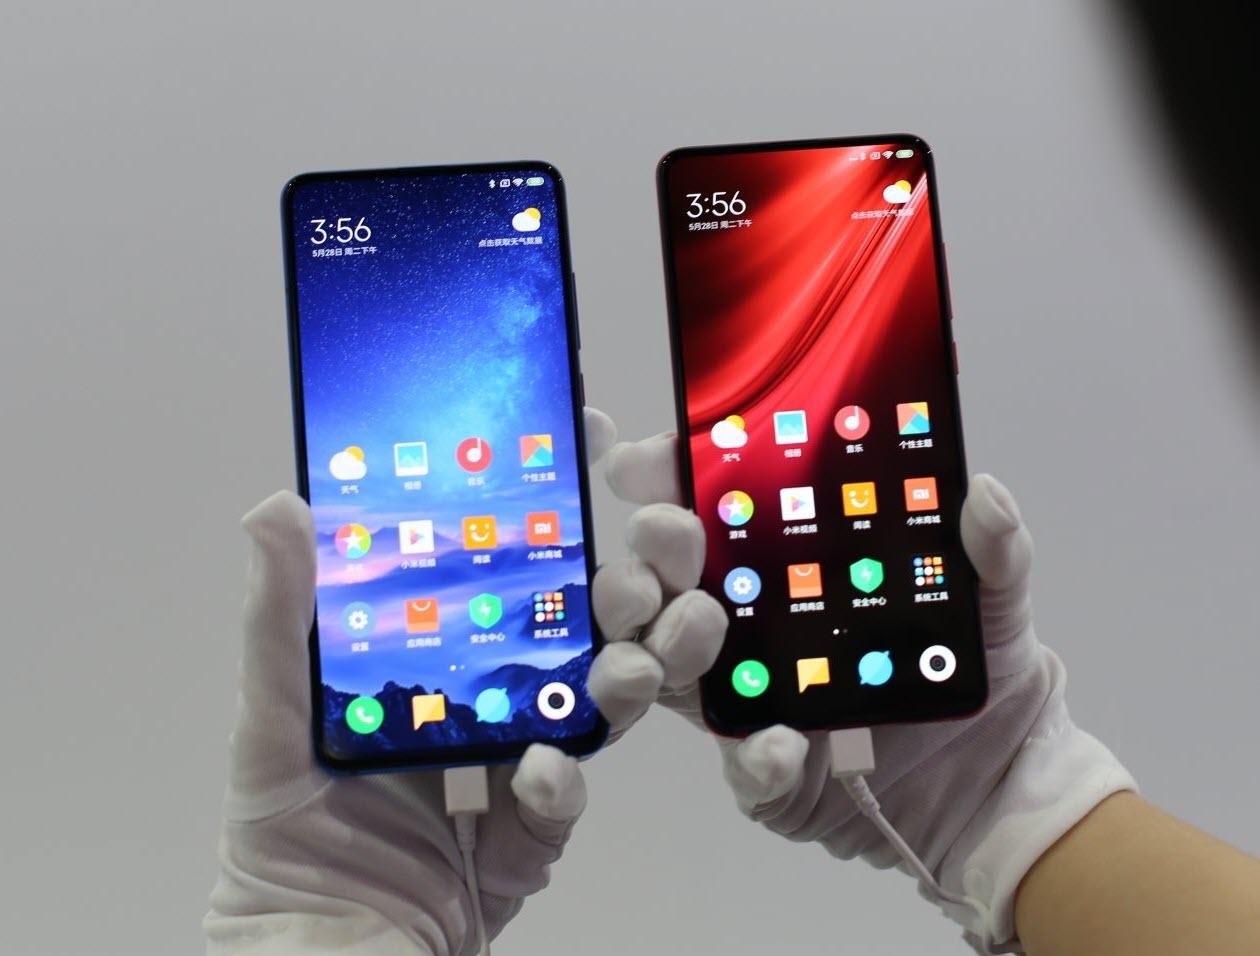 4e280b9a3 مراجعة سعر ومواصفات هاتف شاومي ريدمي Redmi K20 و Redmi K20 Pro ~ موبانكو